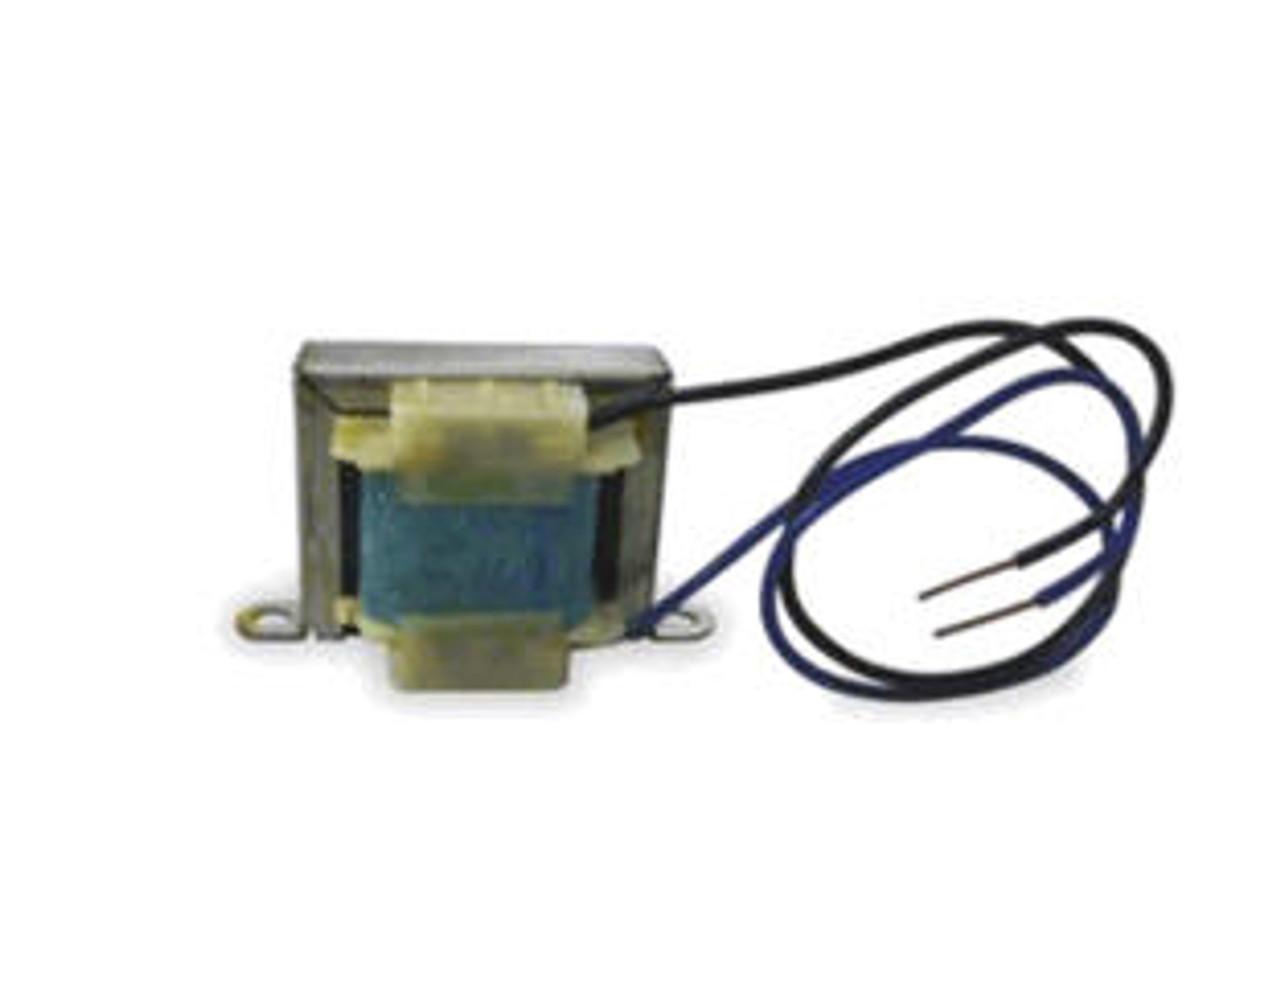 Advance LPL-5-9 Transformer Fluorescent 120V Ballast for 4W 5W 6W 7W 8W 9W 1